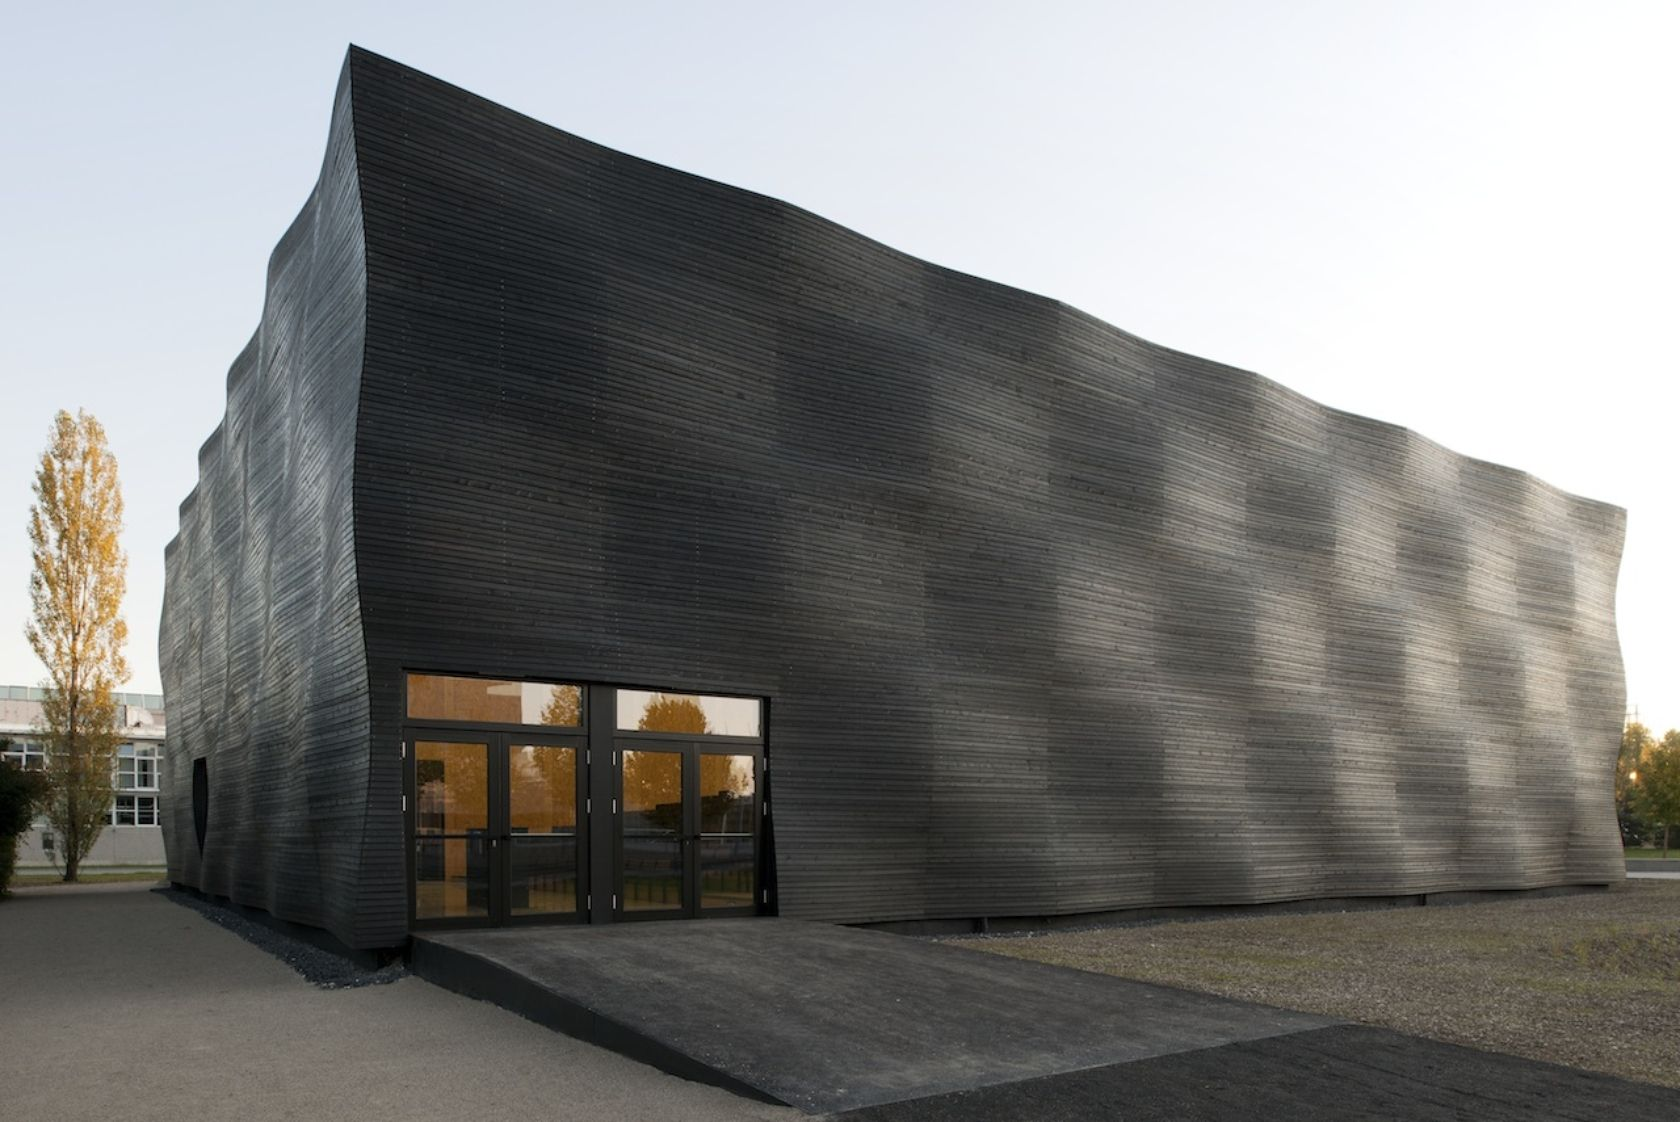 Interims Audimax - Explore, Collect and Source architecture